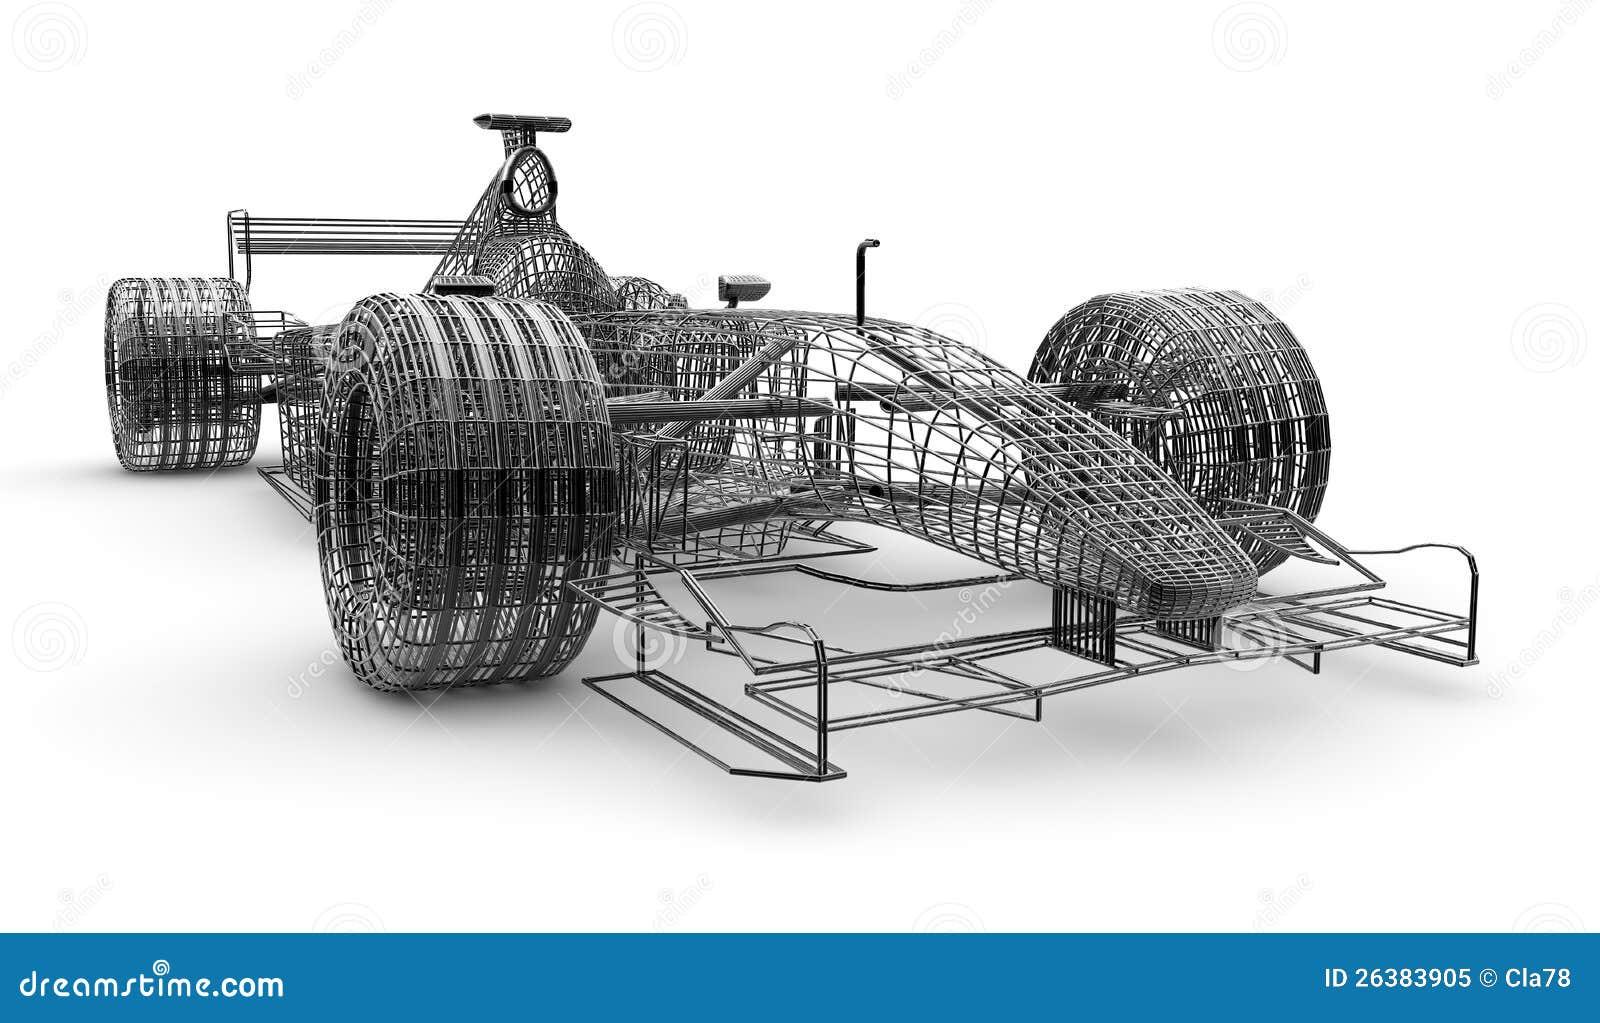 Wireframe formula 1 car stock illustration. Illustration of abstract ...